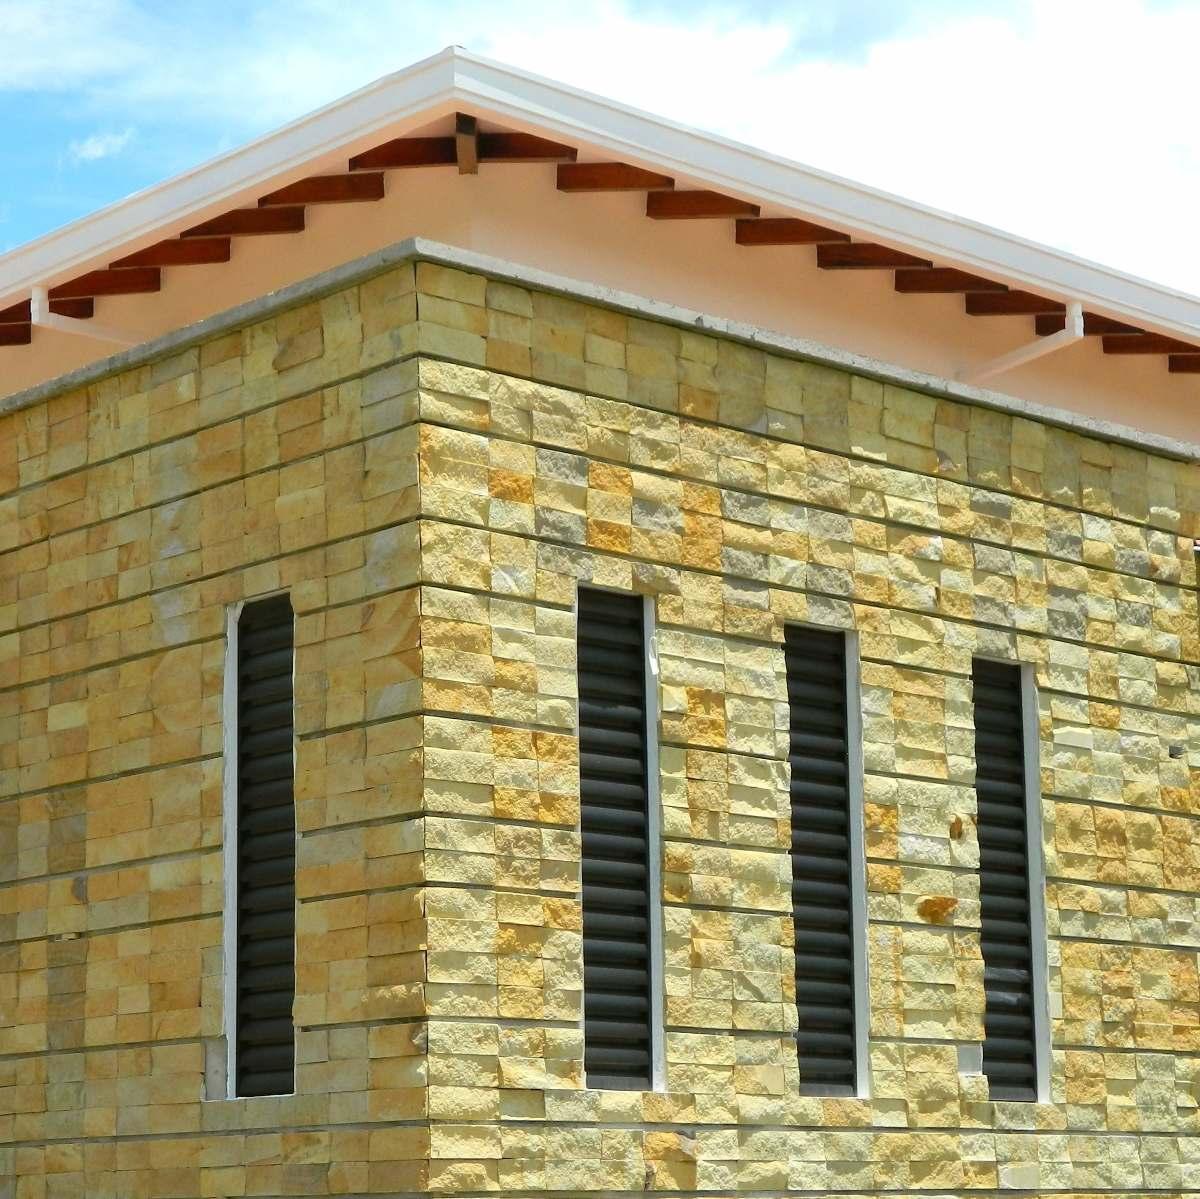 Enchapes de piedra natural para muros interiores for Piedra natural para exterior